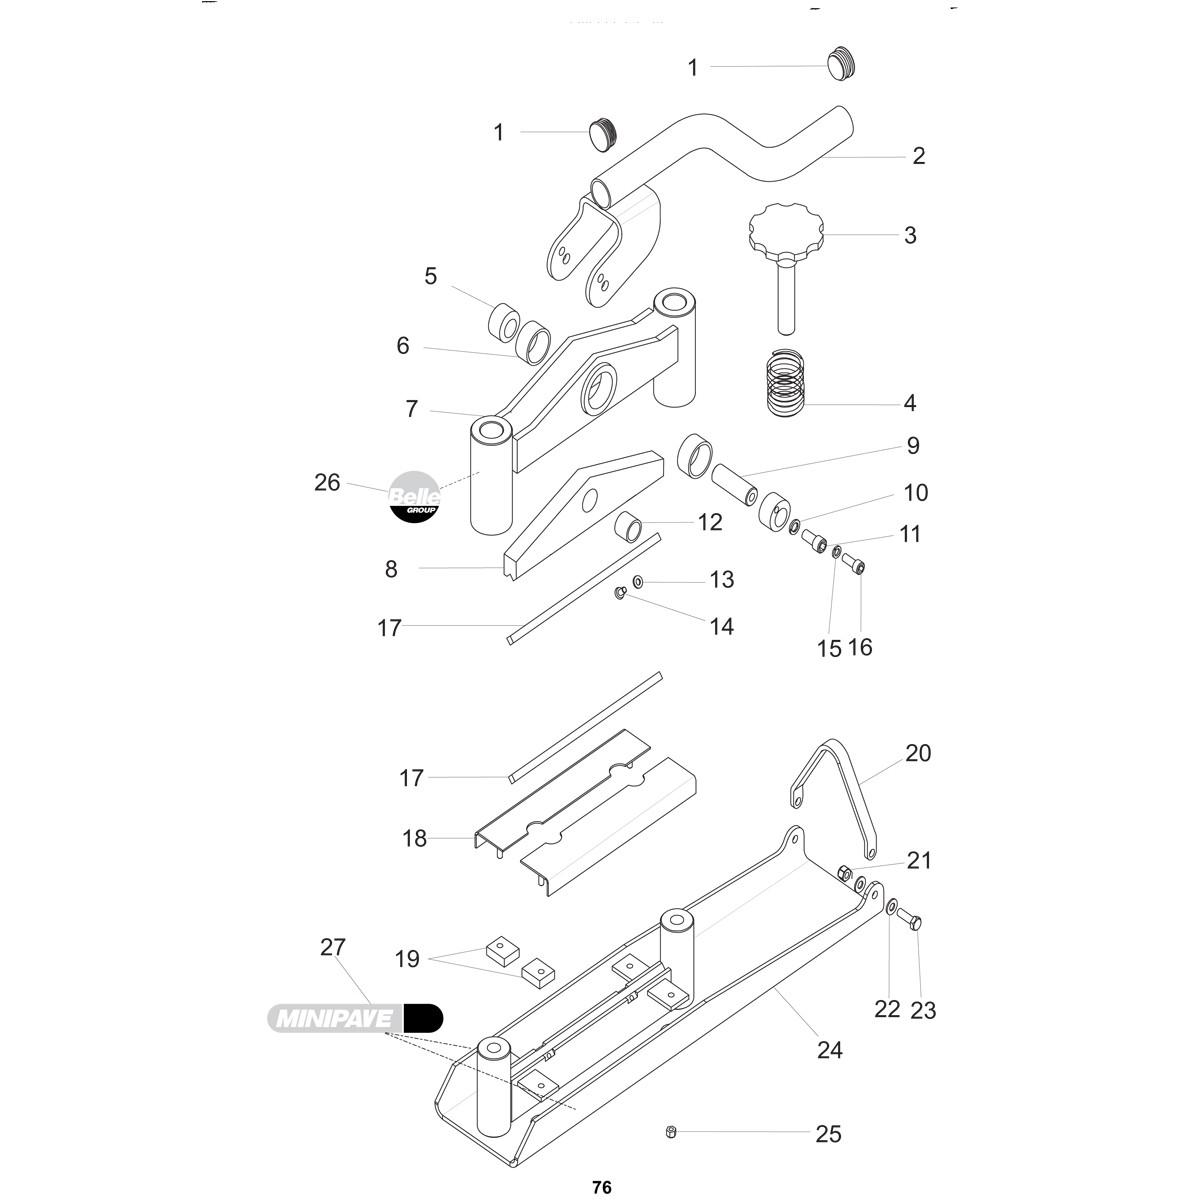 Minipave Block Splitter Parts